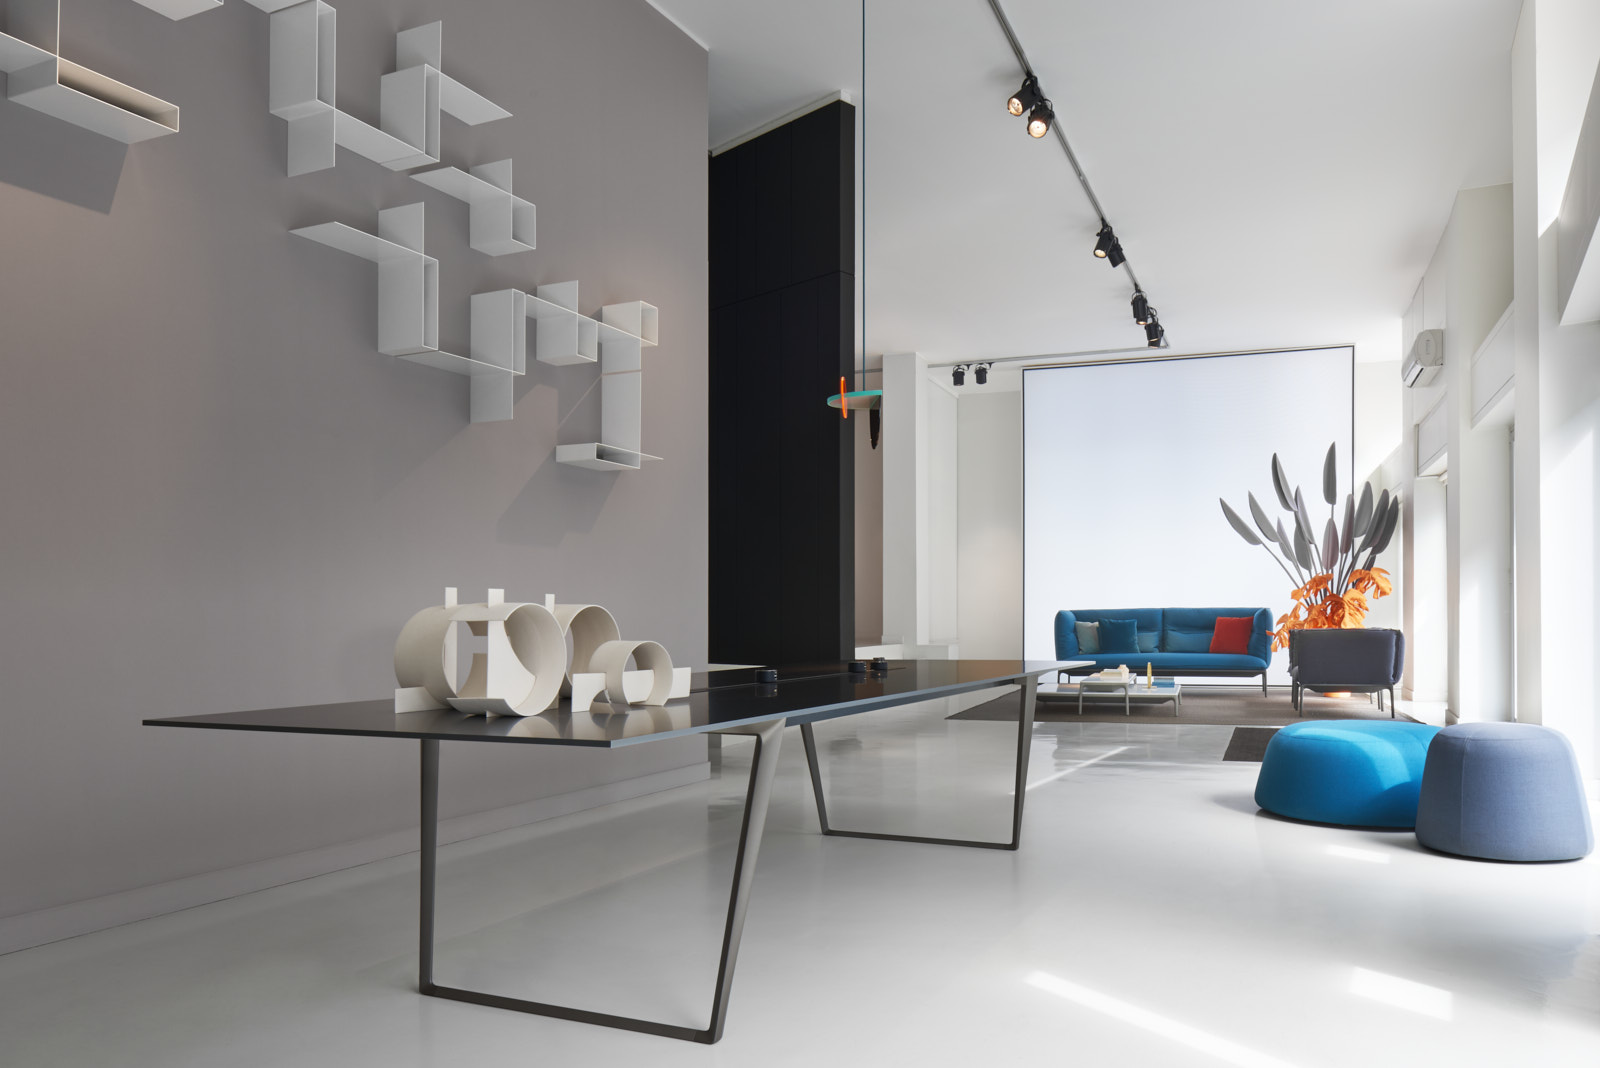 Copertina MDFitalia Milano Design week 2018 | LCBstudio